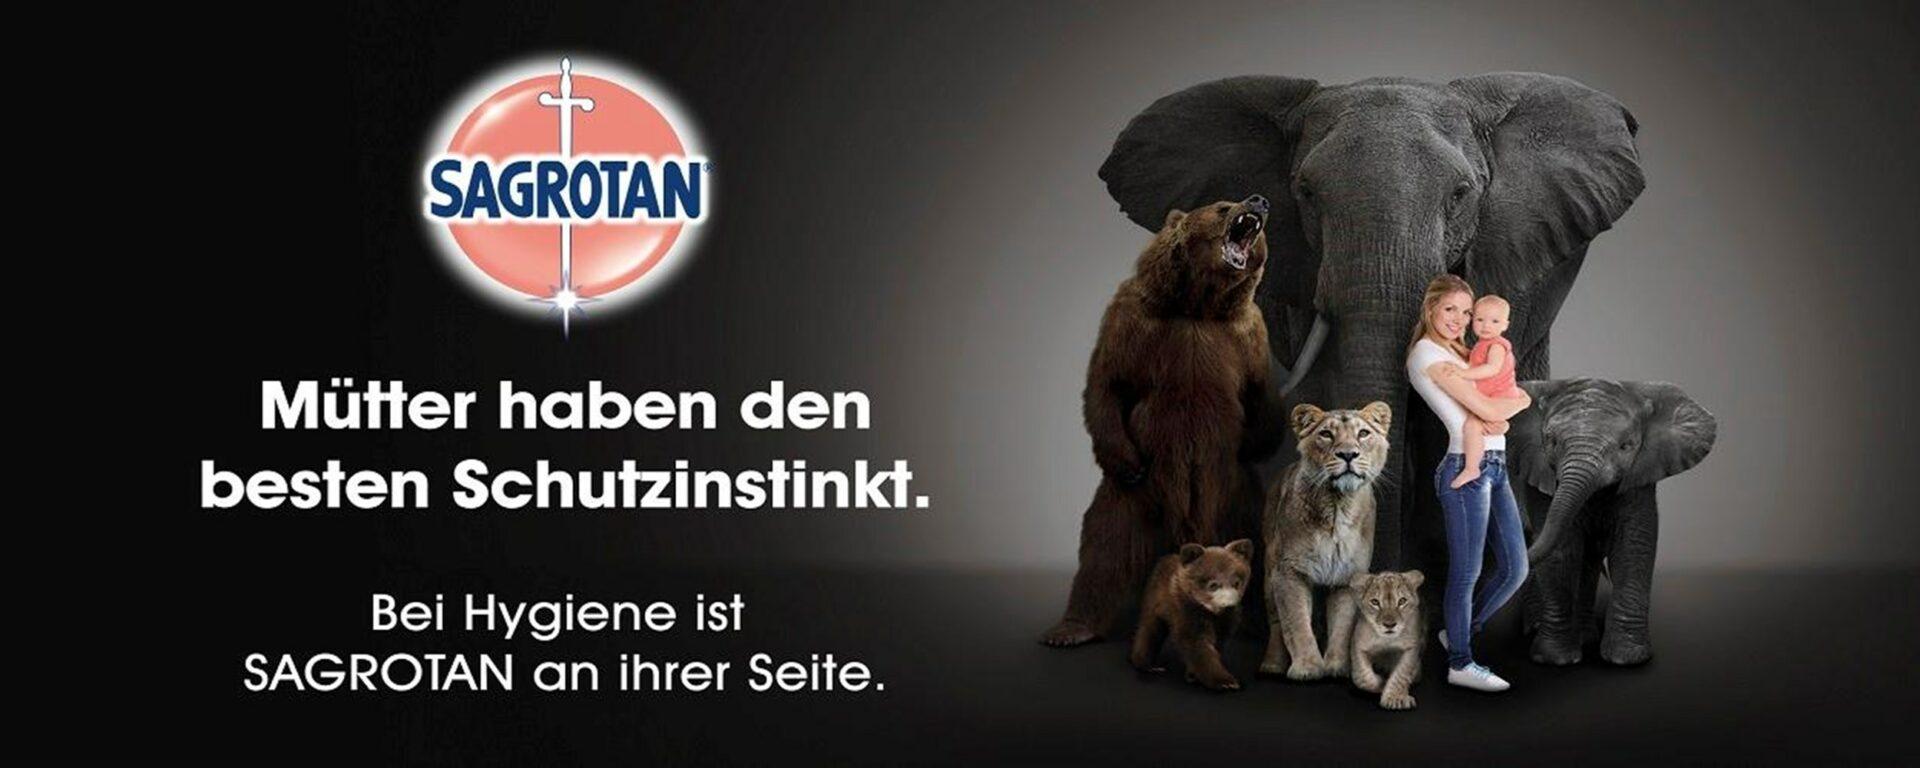 p17-0915_sagrotan_animals_1260x500-px-1a